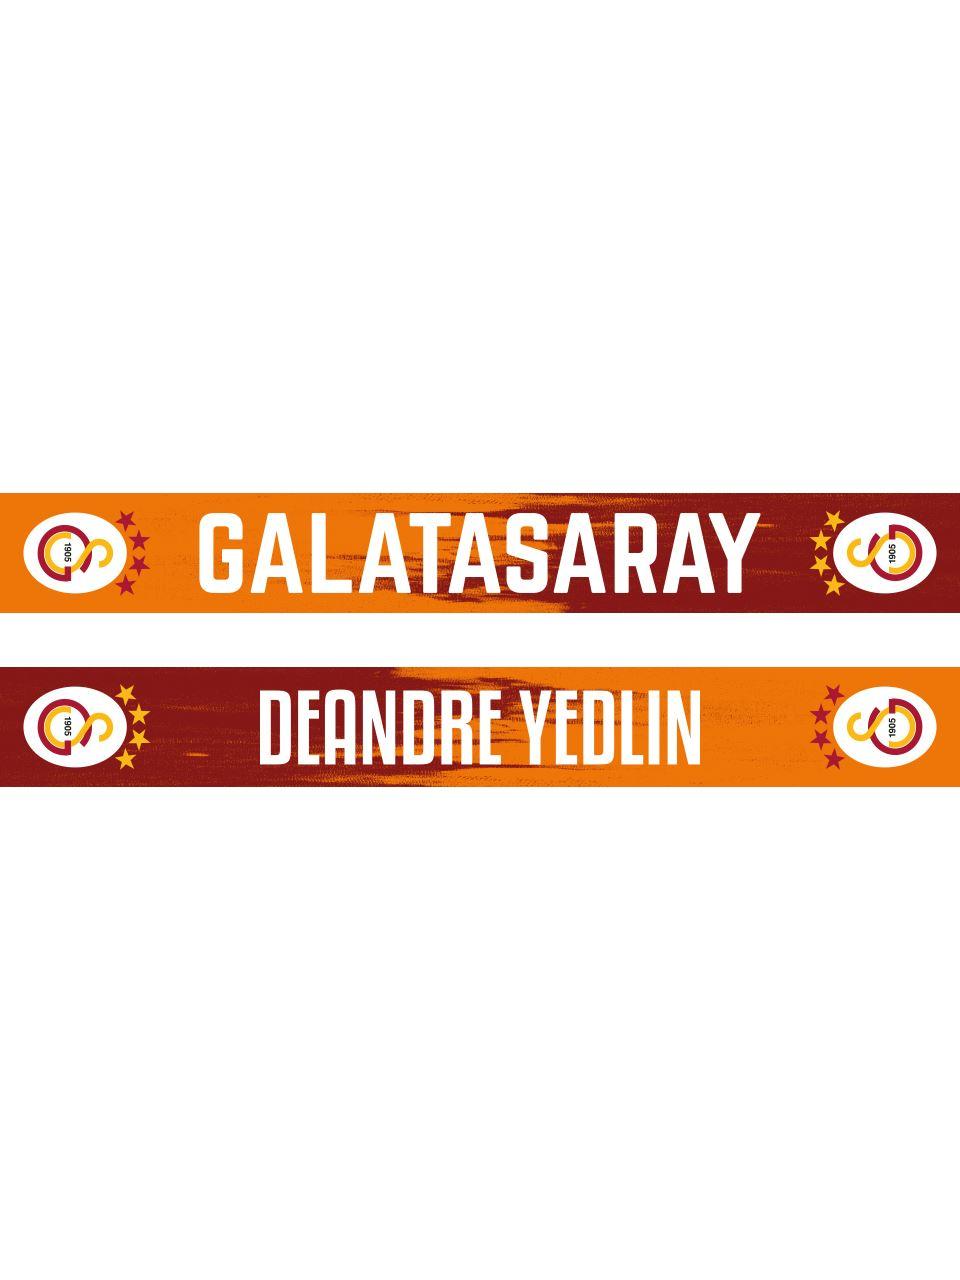 DeAndre Yedlin Galatasaray Şal Atkı U999055